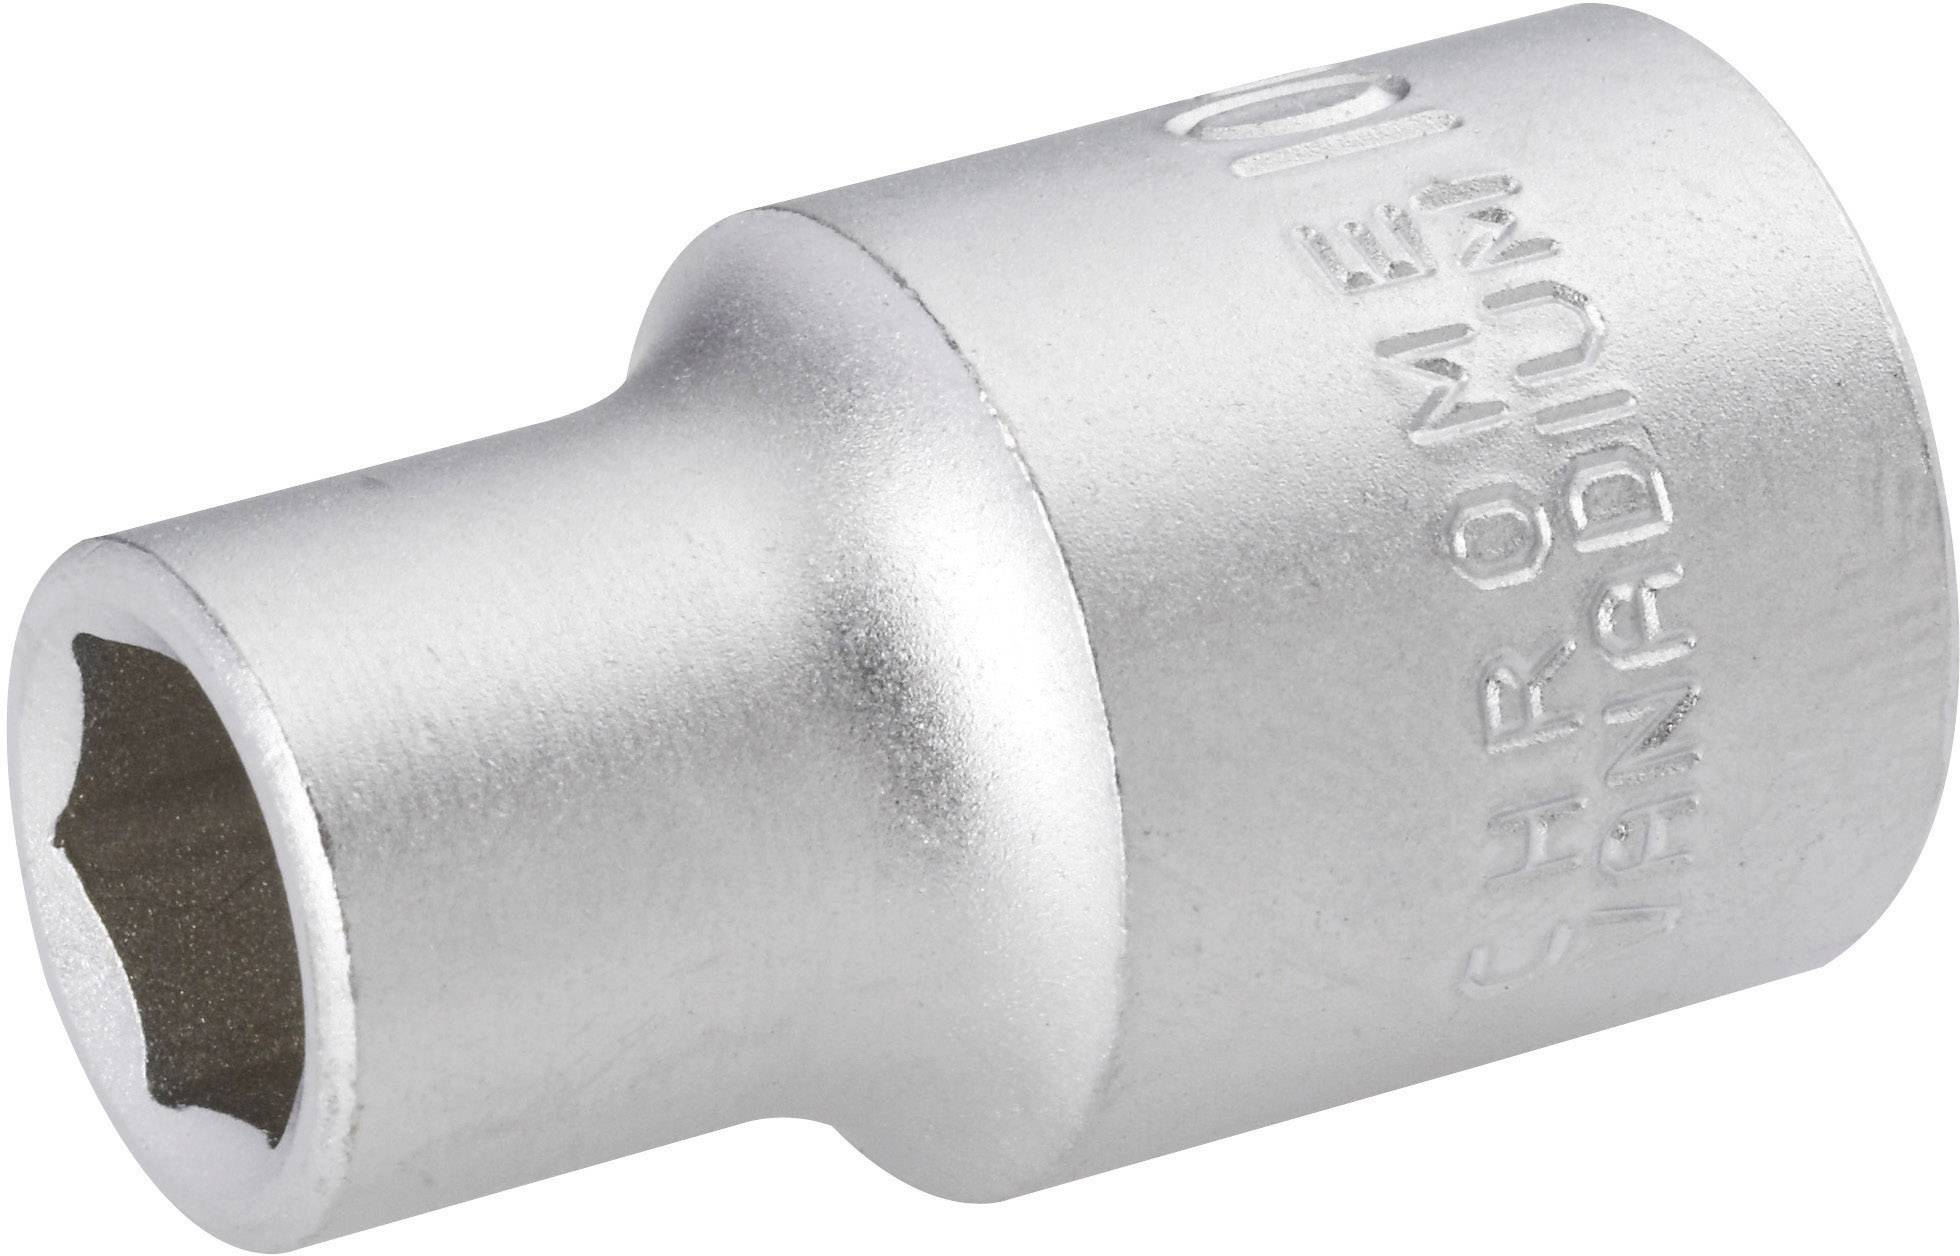 "Nadstavec na račňu TOOLCRAFT 820764, 1/2"" (12.5 mm), 11 mm"